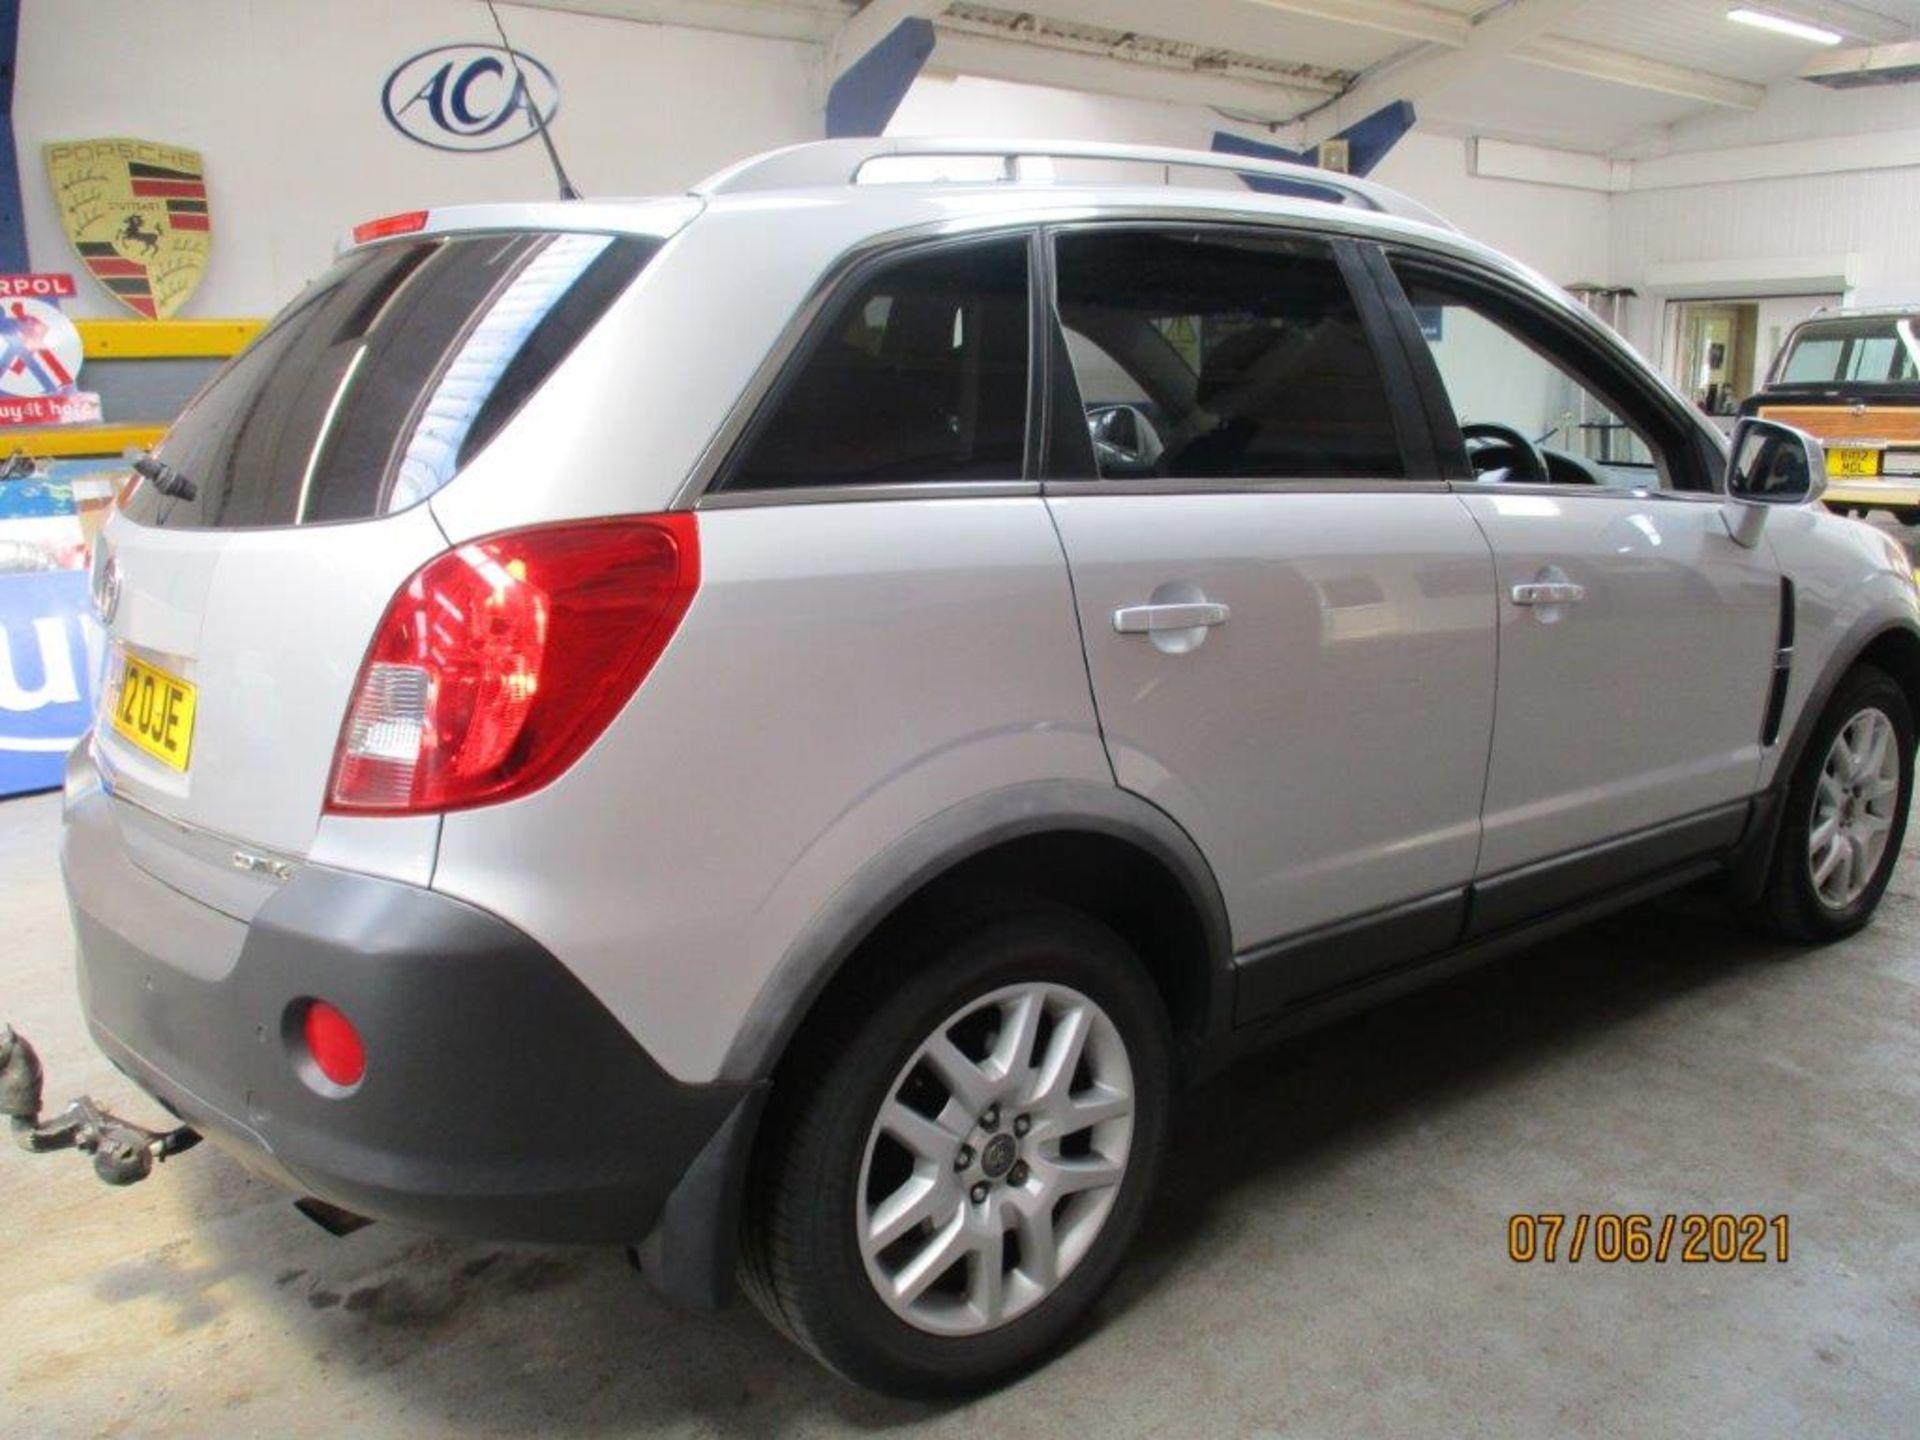 12 12 Vauxhall Antara Excl CDTI - Image 5 of 18